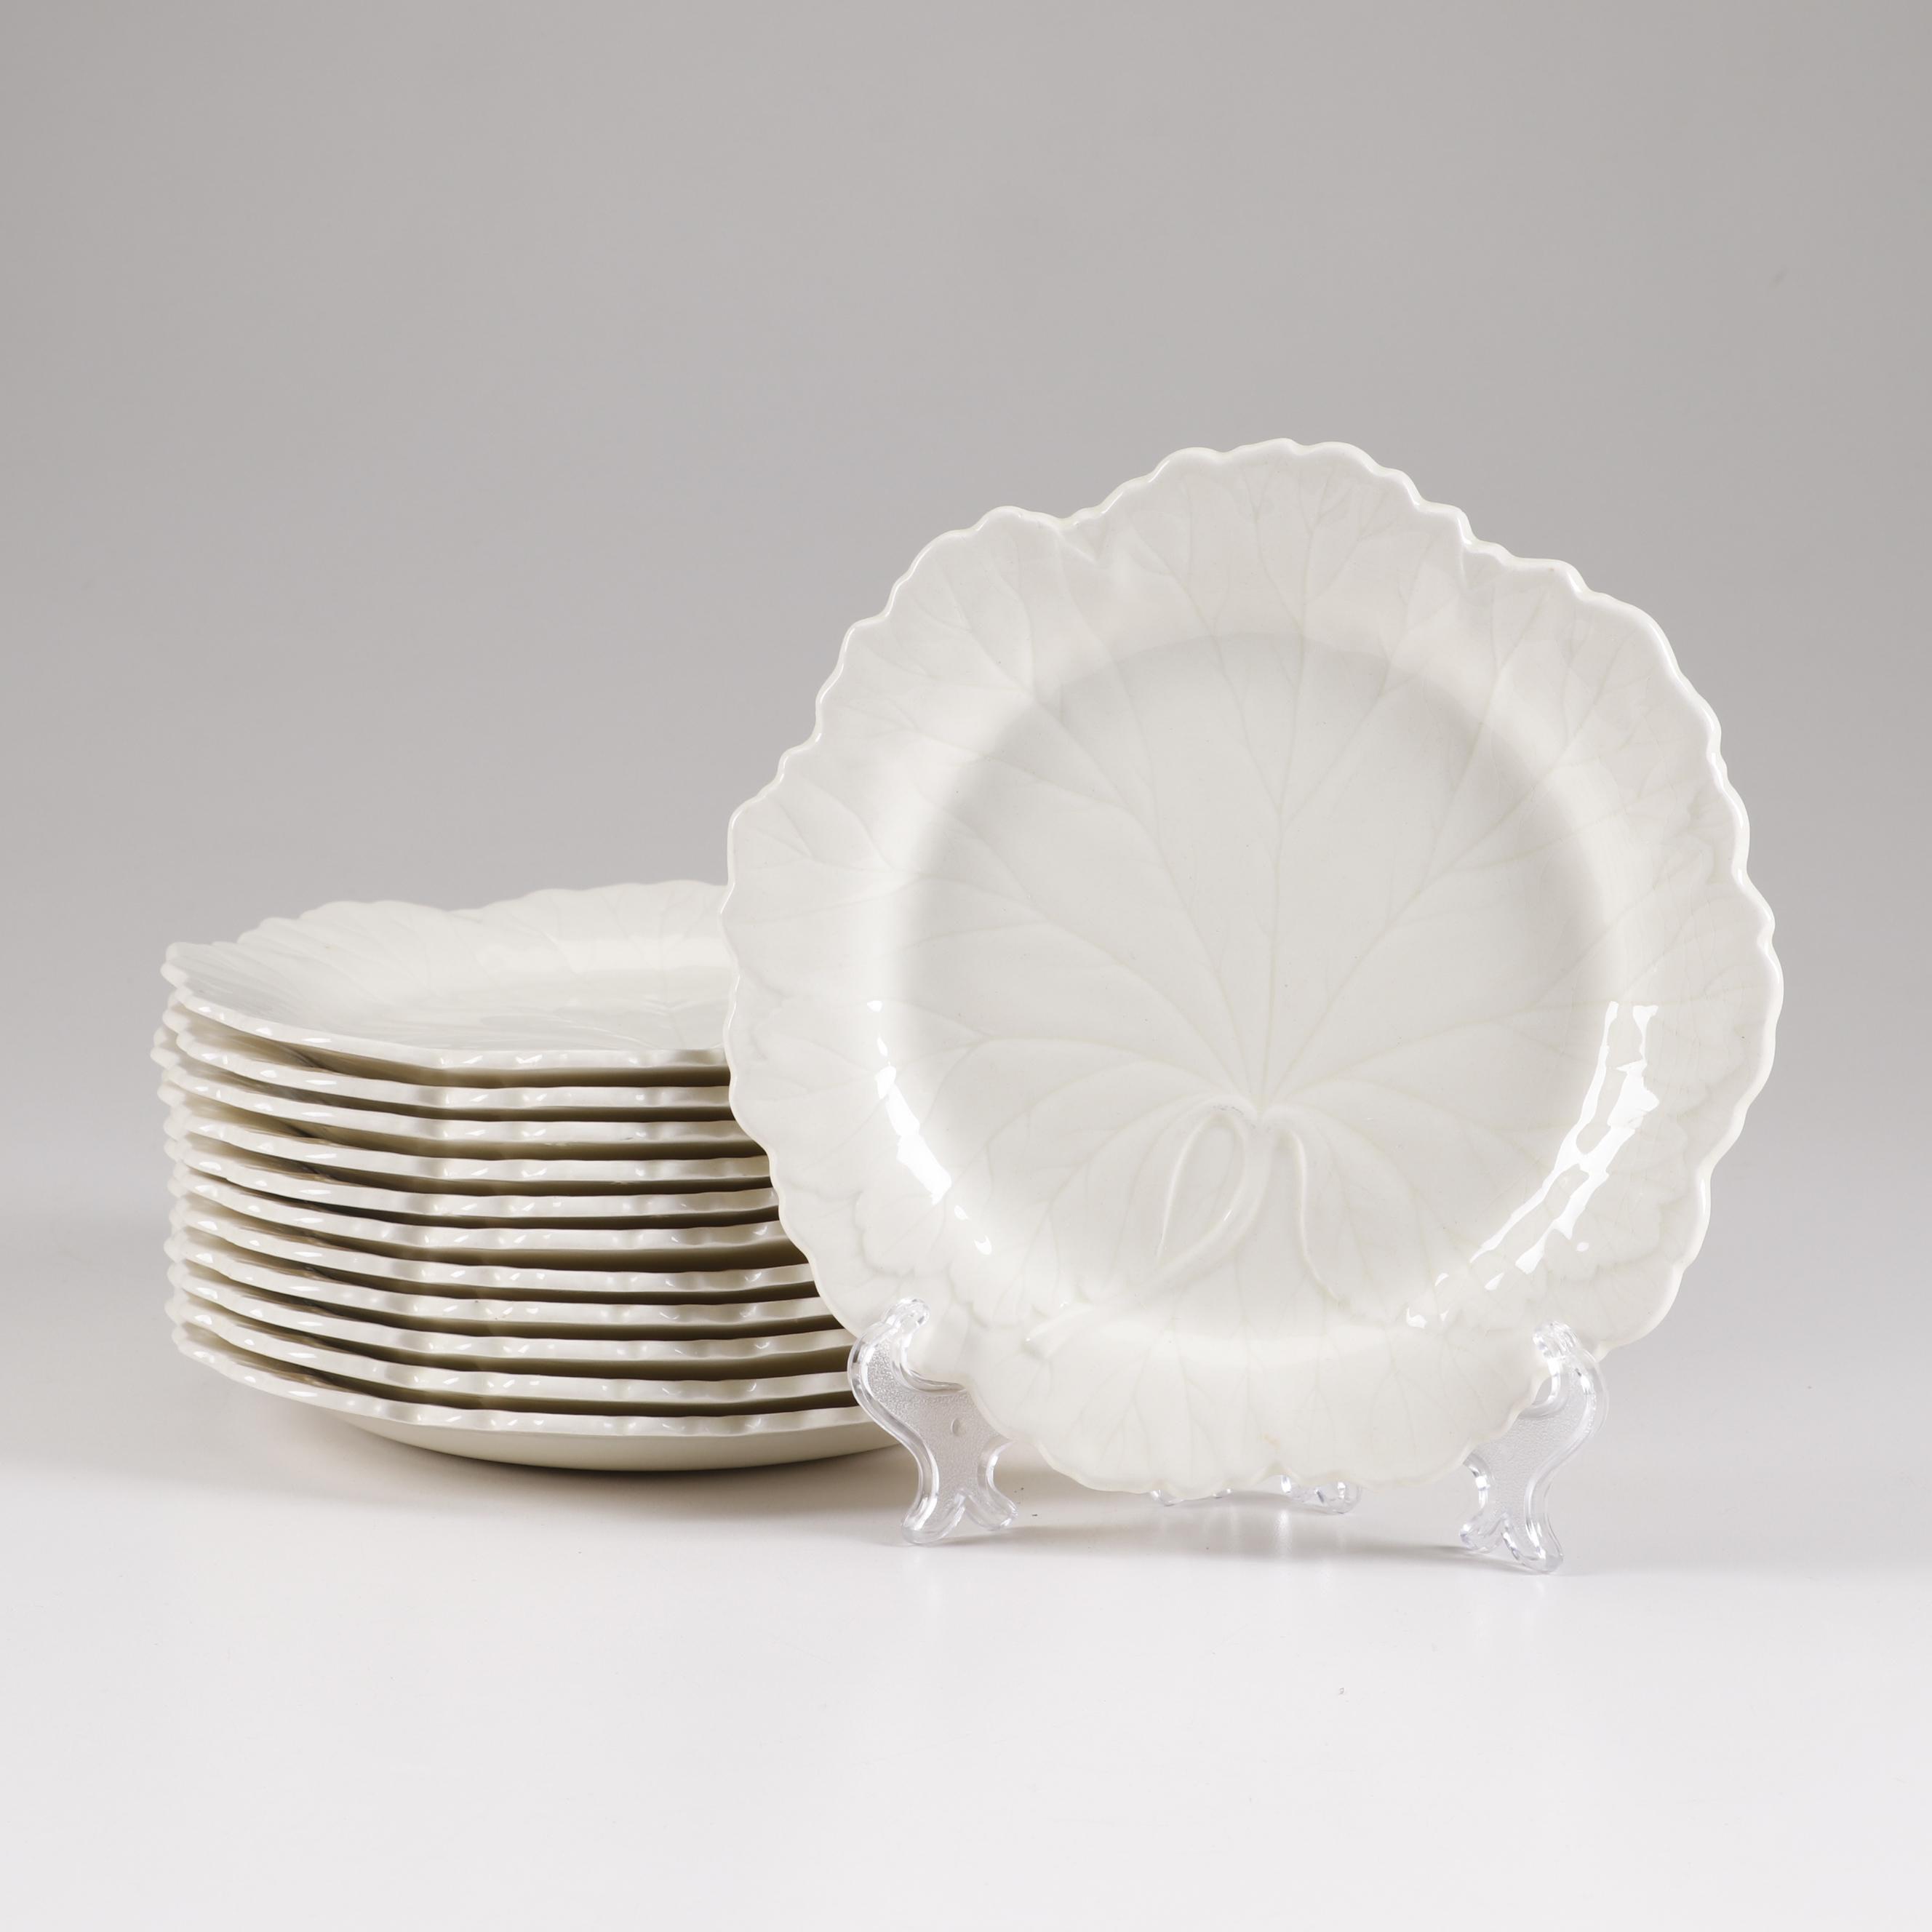 Wedgwood of Etruria & Barlaston Ceramic Cabbage Leaf Plates